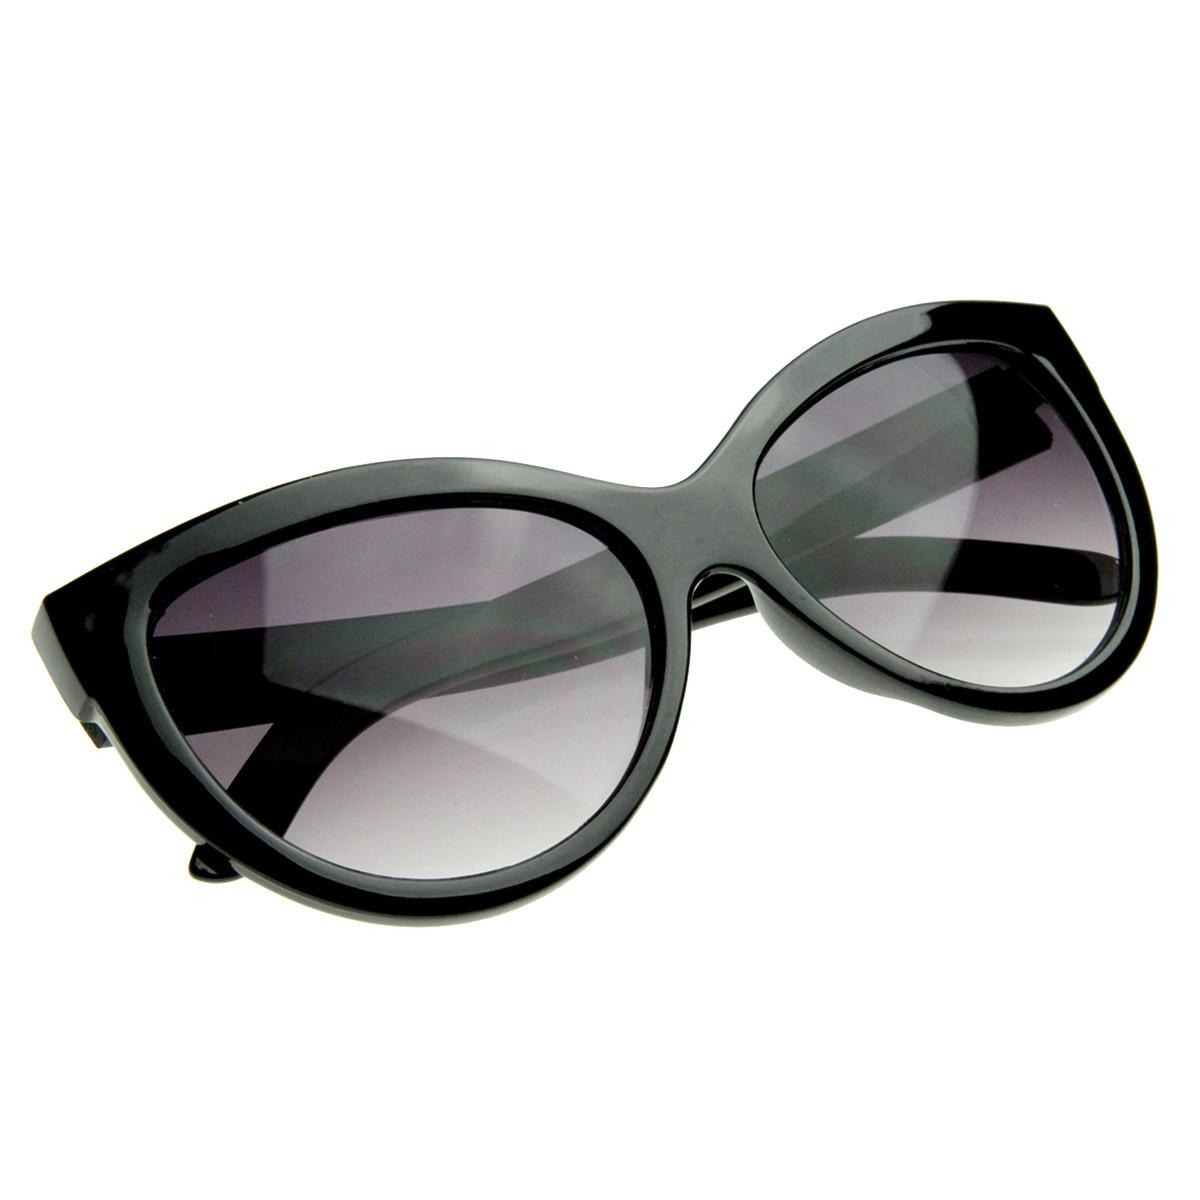 Womens designer high temple modern cat eye sunglasses 8217